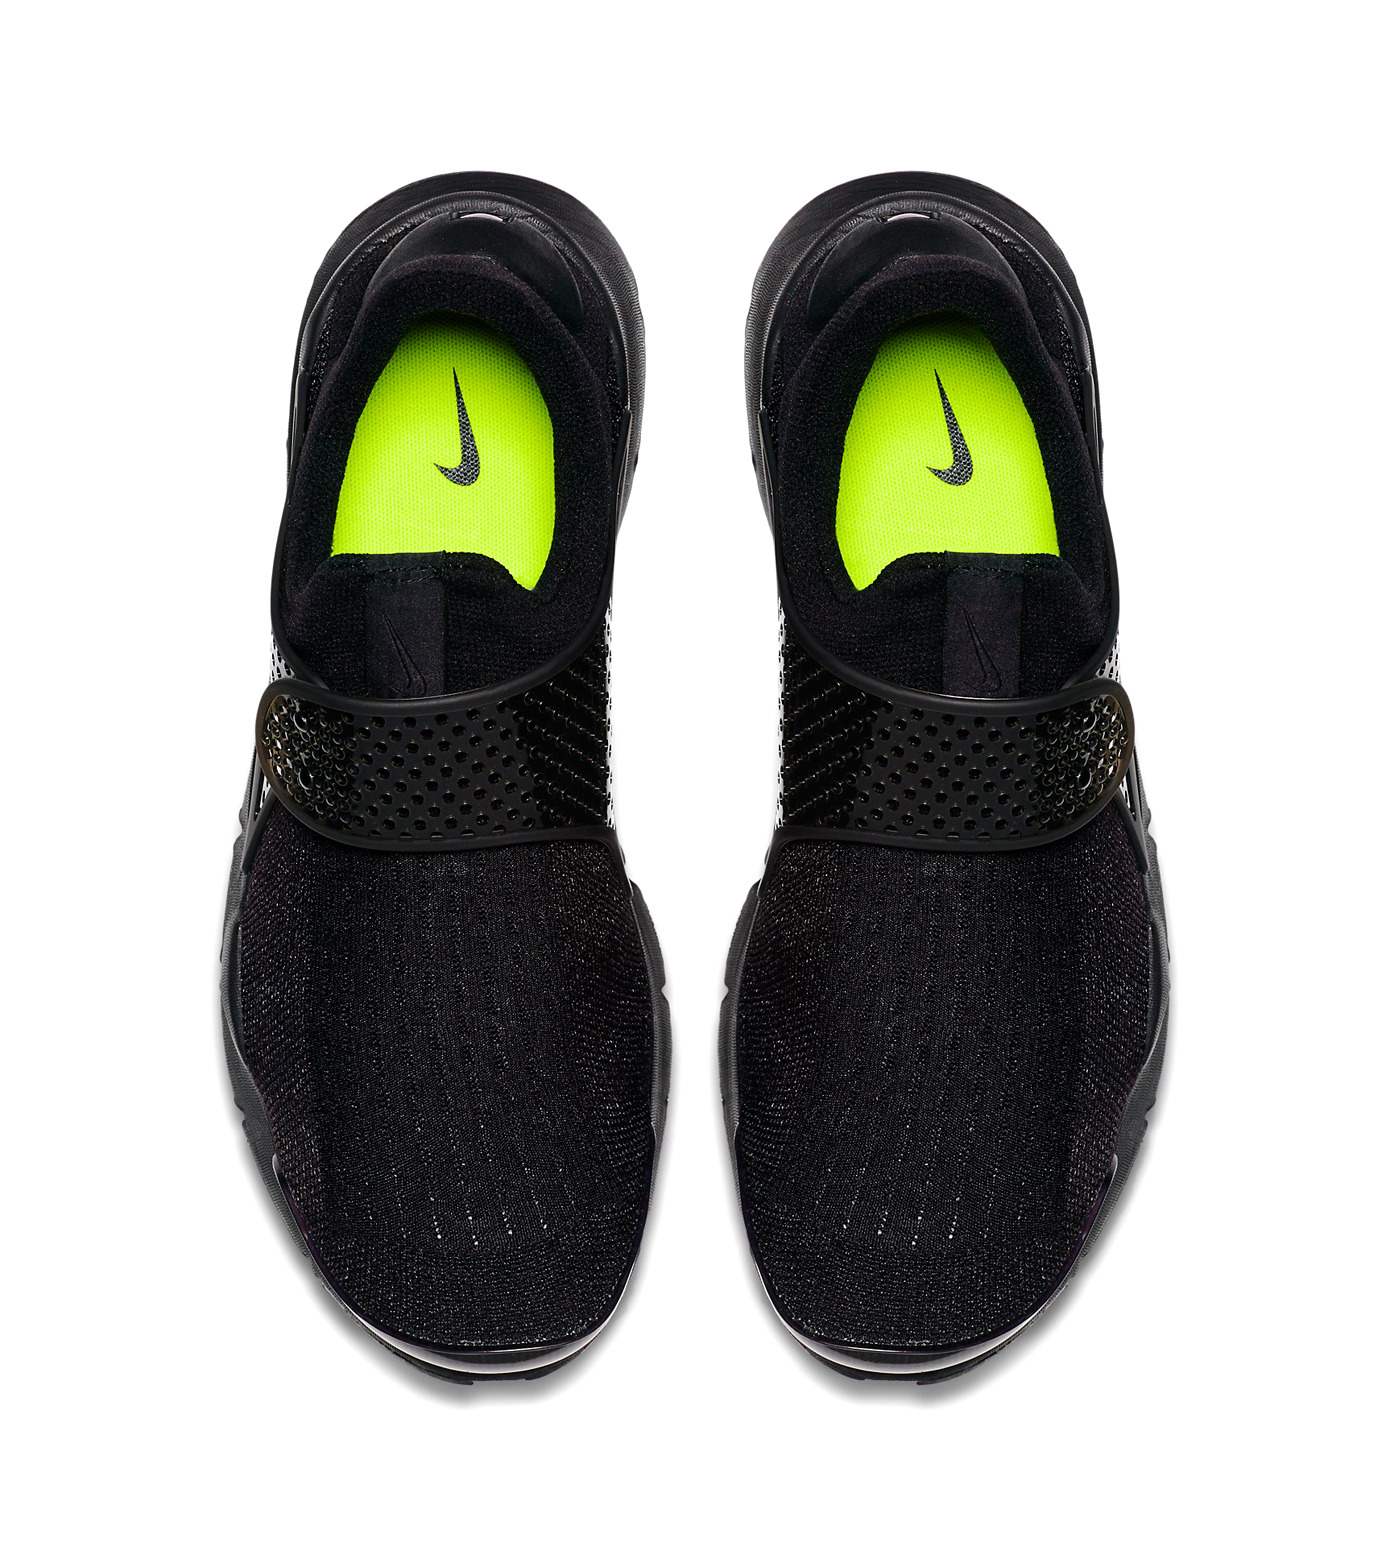 NIKE(ナイキ)のSOCK DART-BLACK(シューズ/shoes)-819686-001-13 拡大詳細画像4